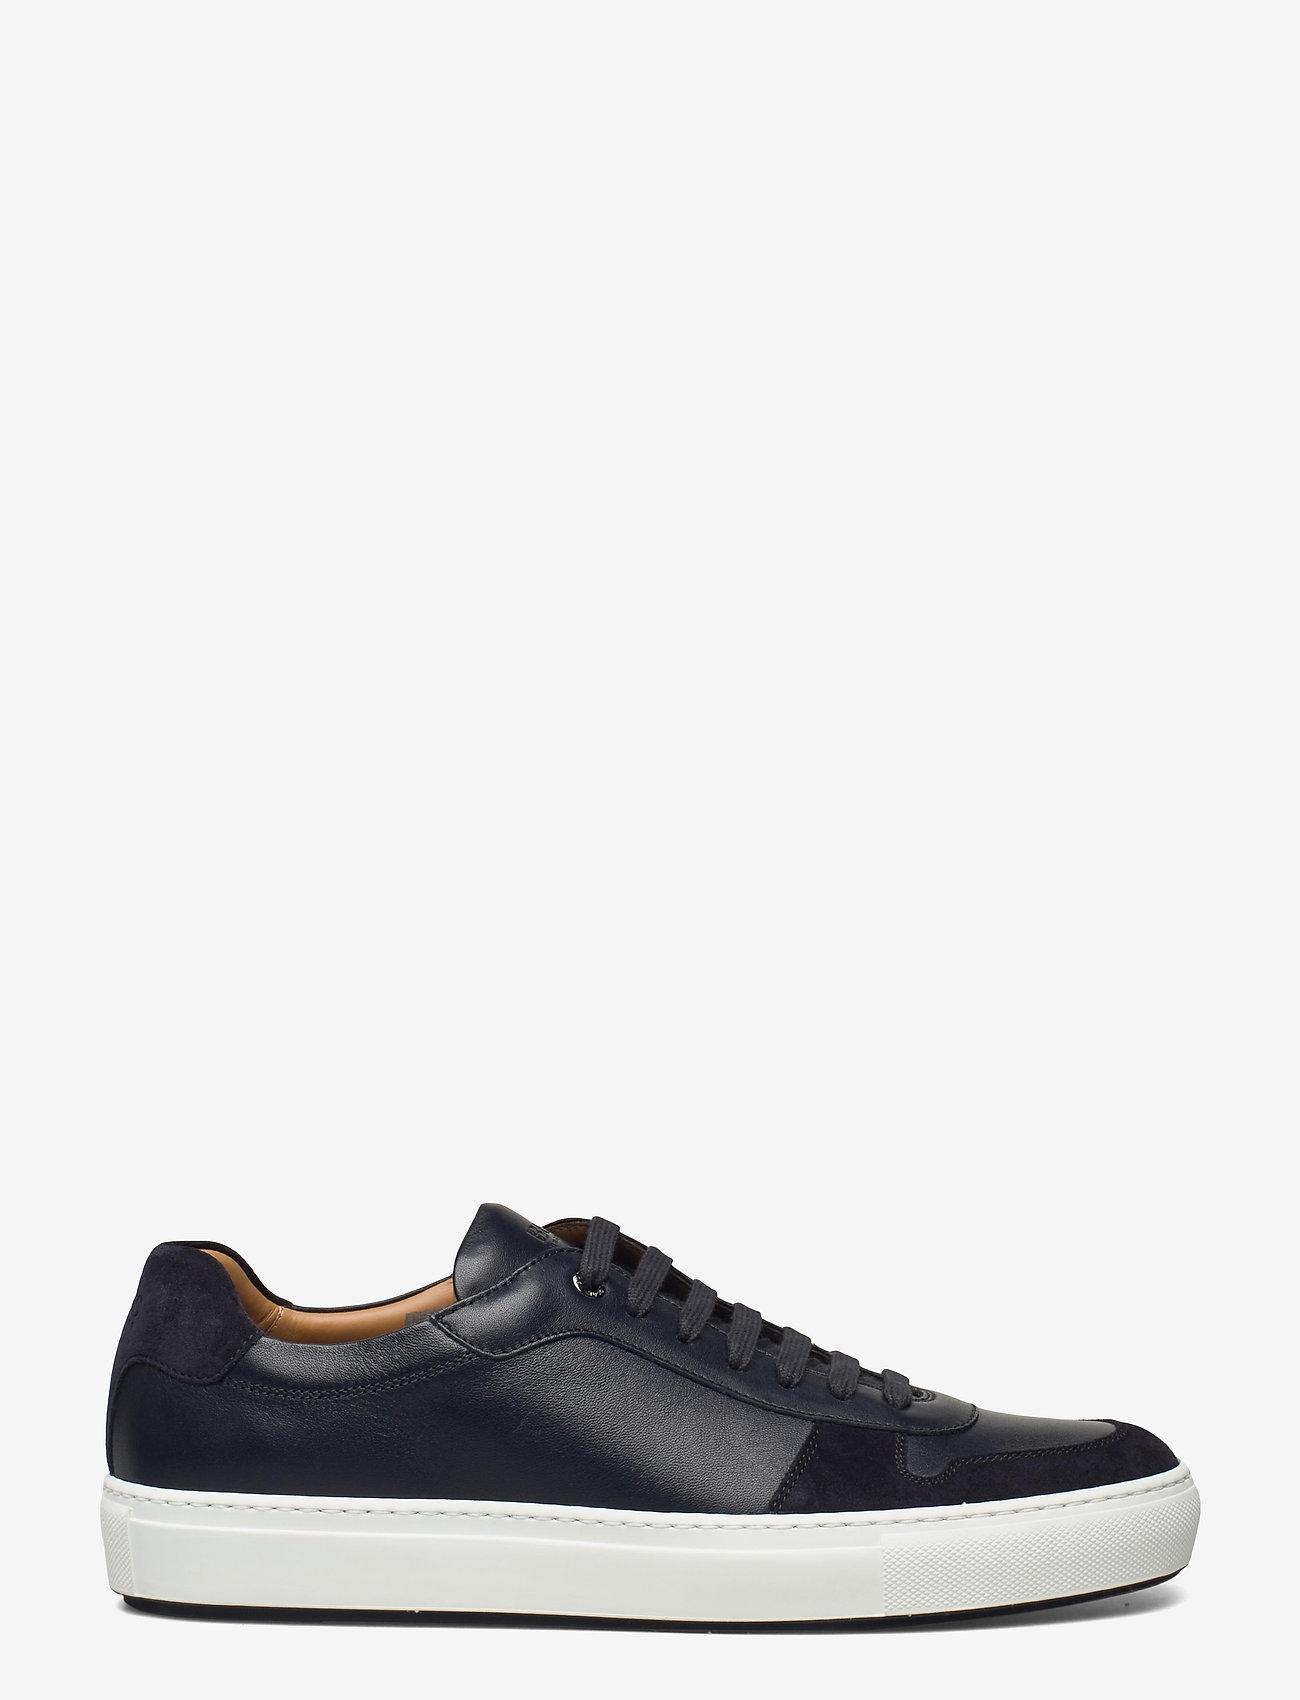 BOSS - Mirage_Tenn_oxns - låga sneakers - dark blue - 1